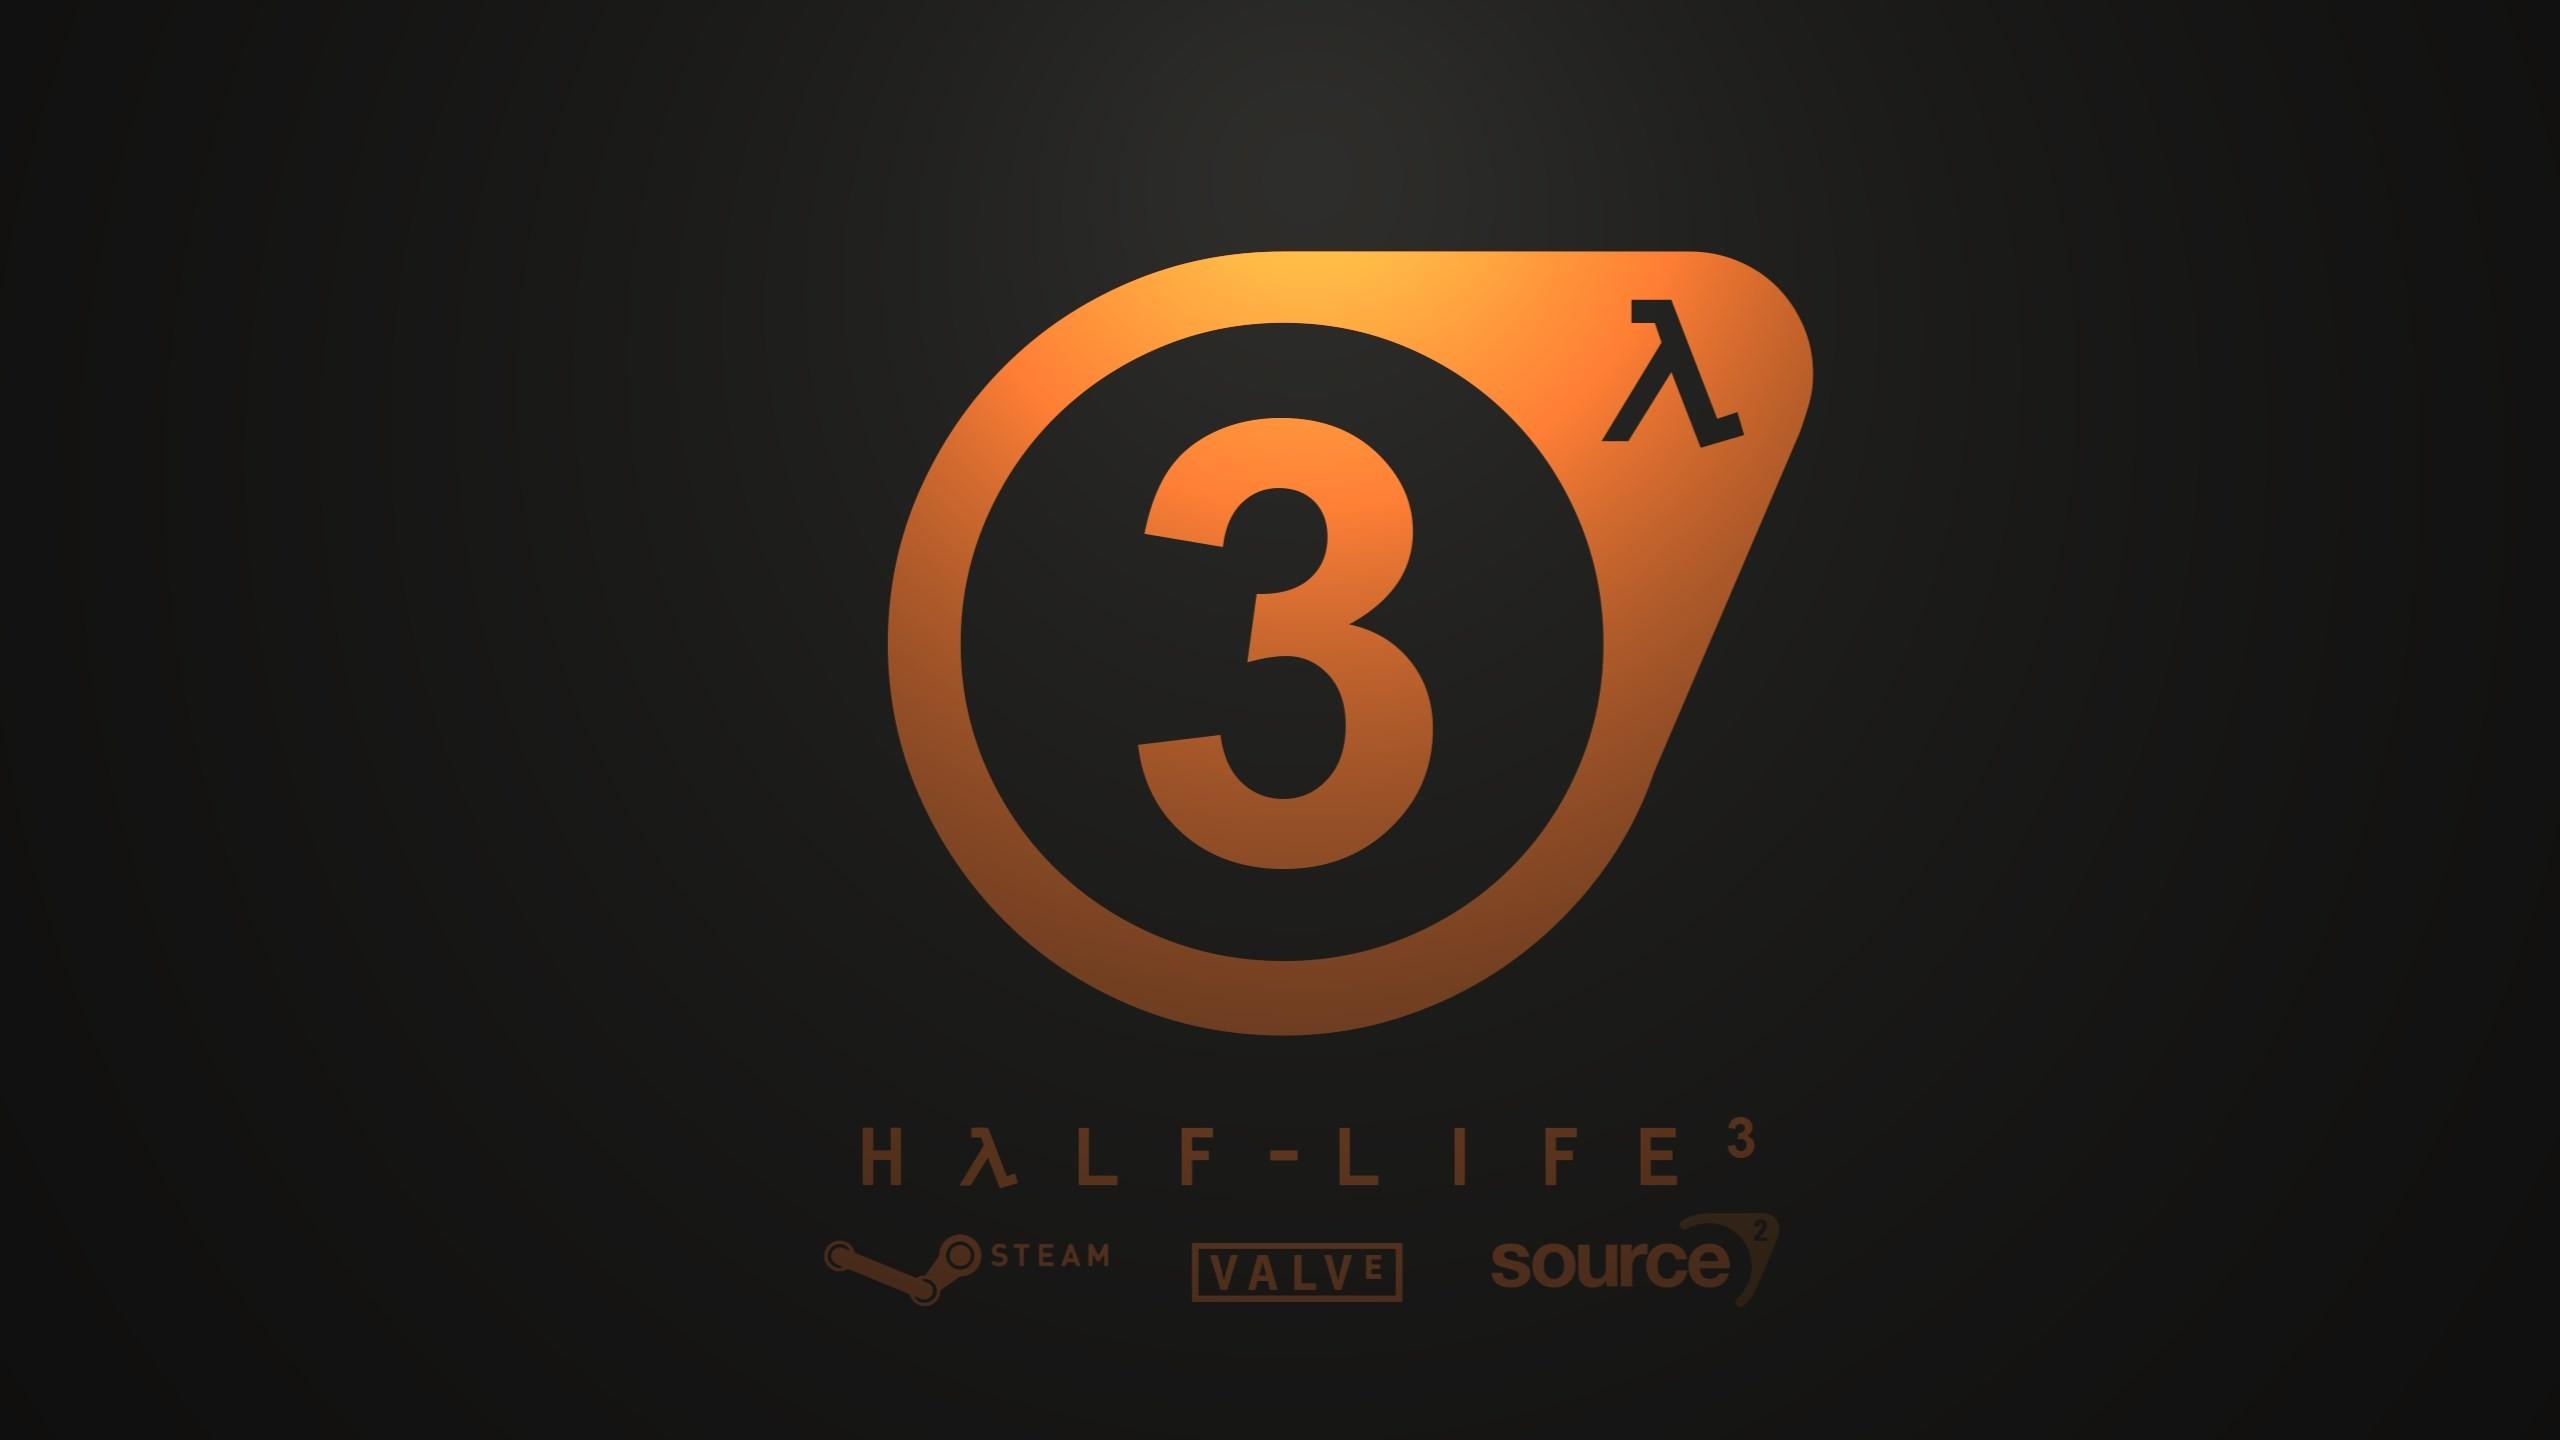 … ball is life wallpaper iphone · half life 3 logo …